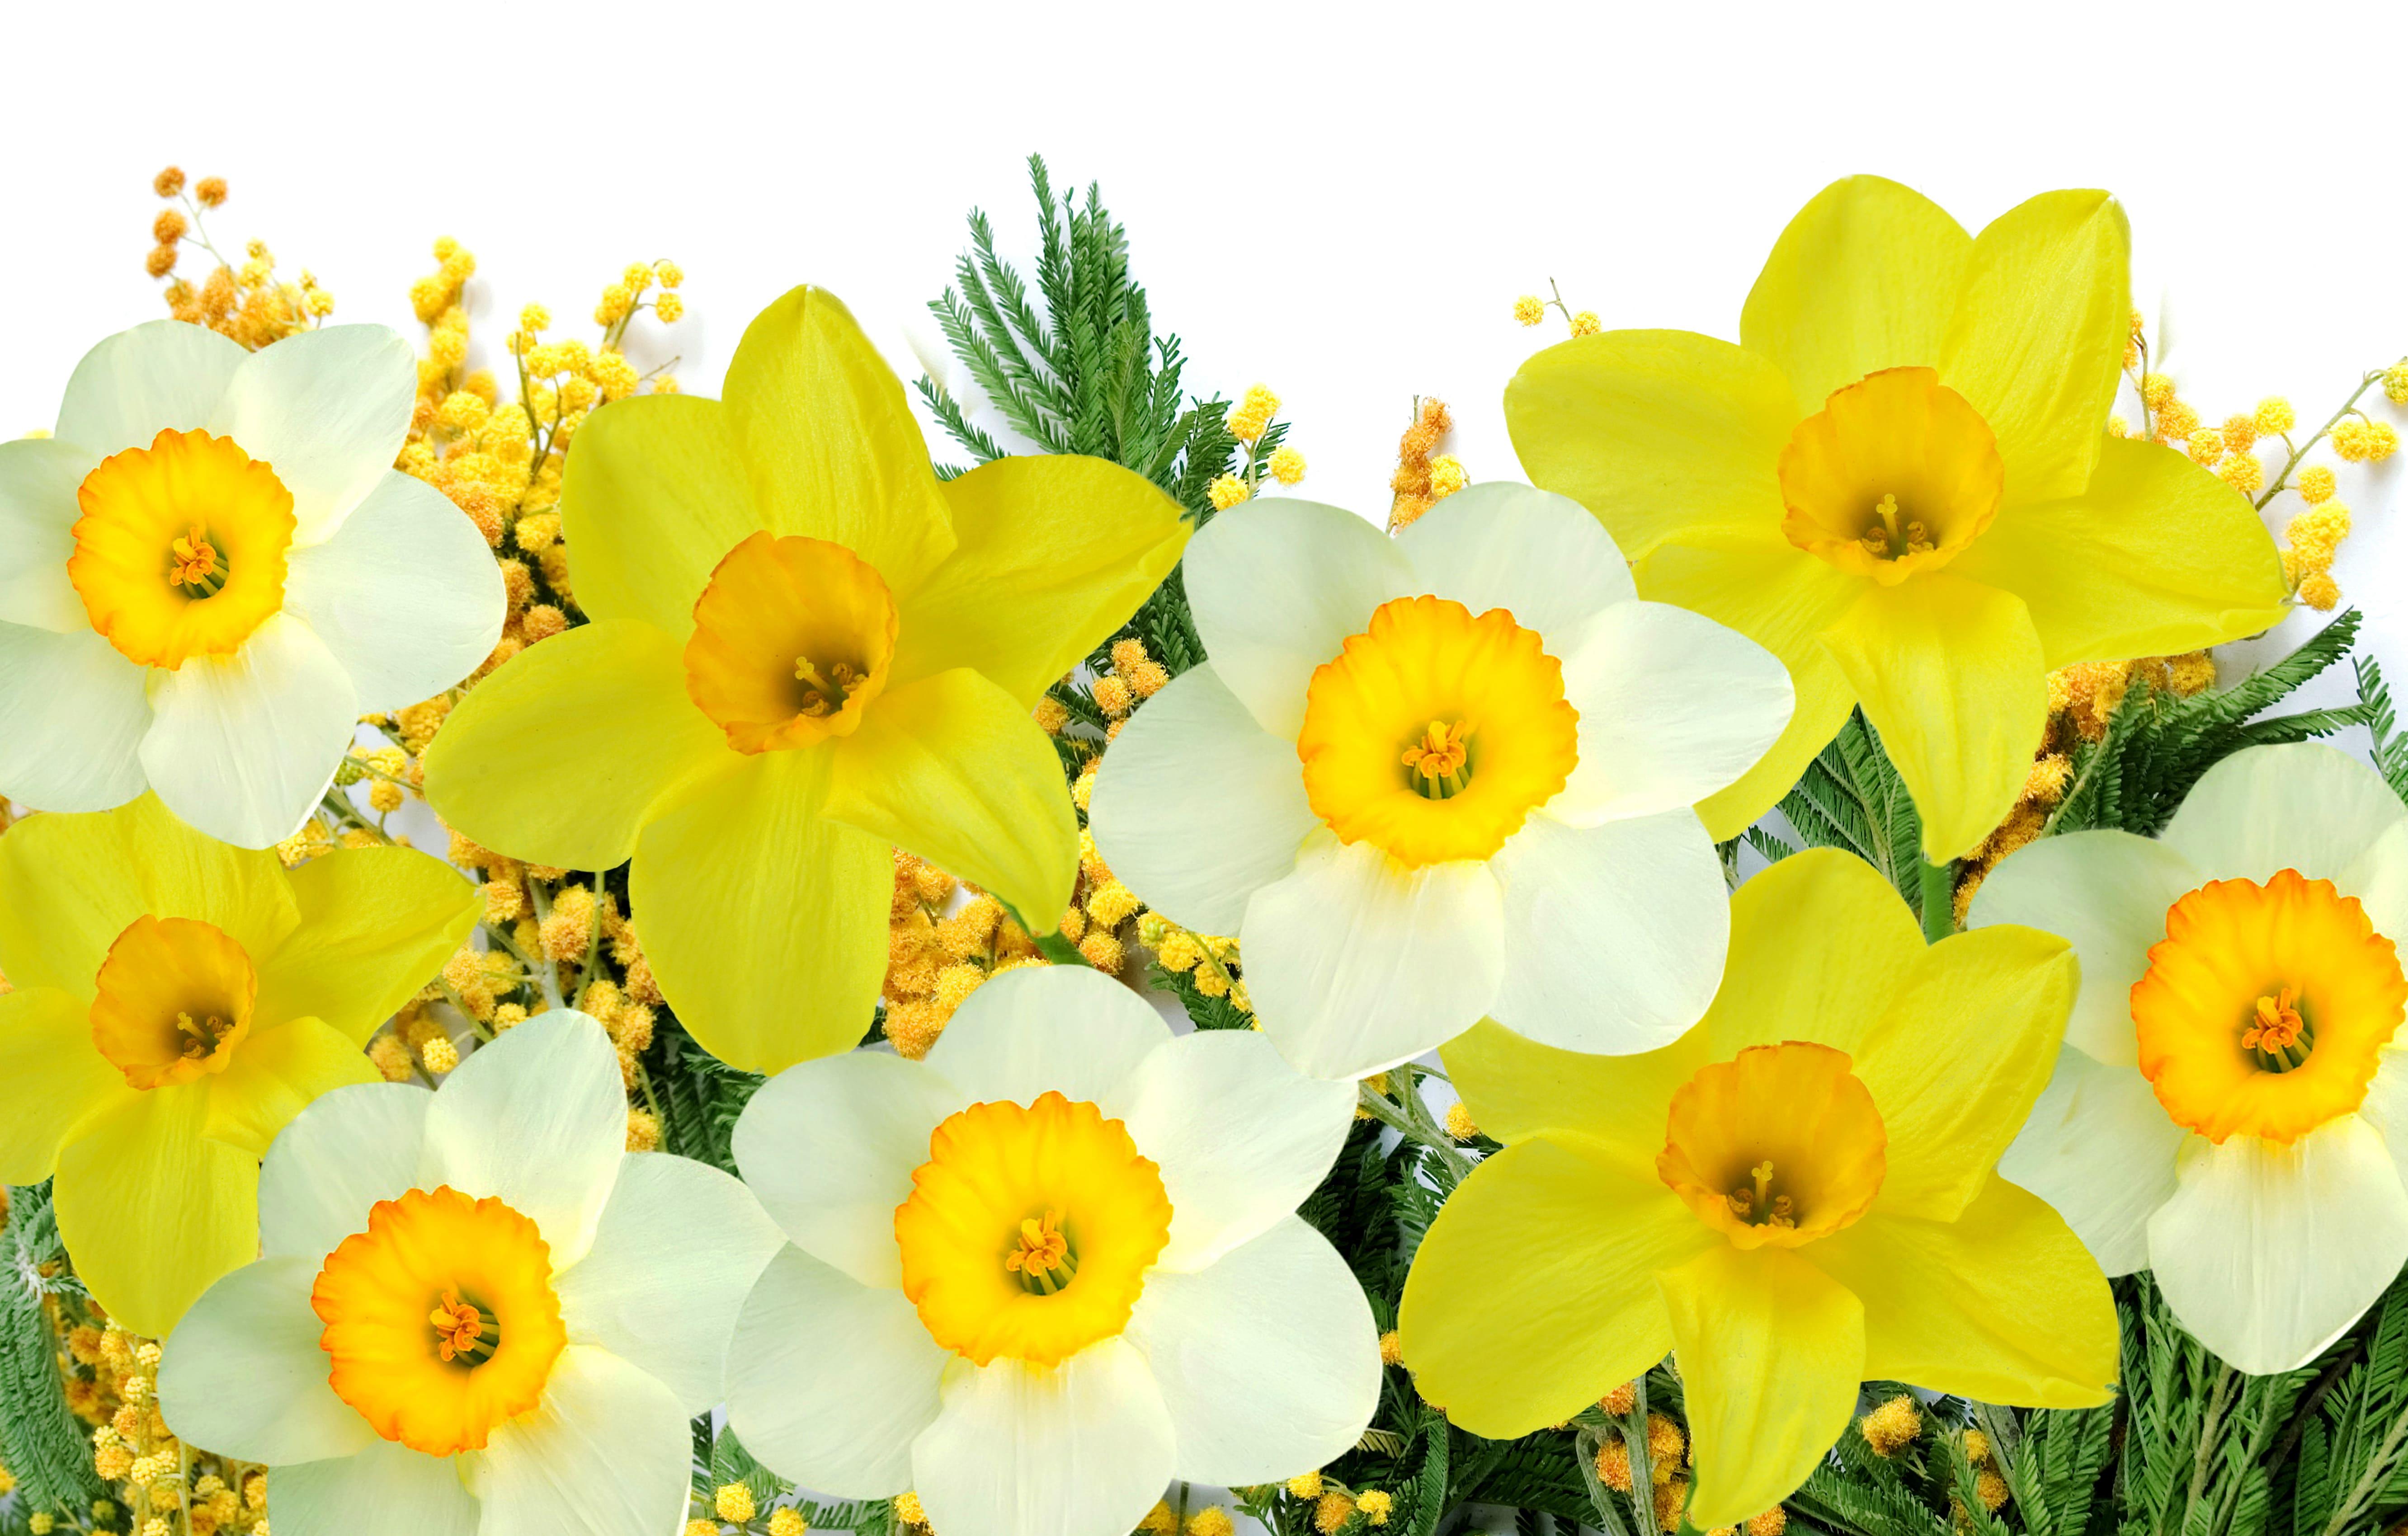 daffodils-photo-45